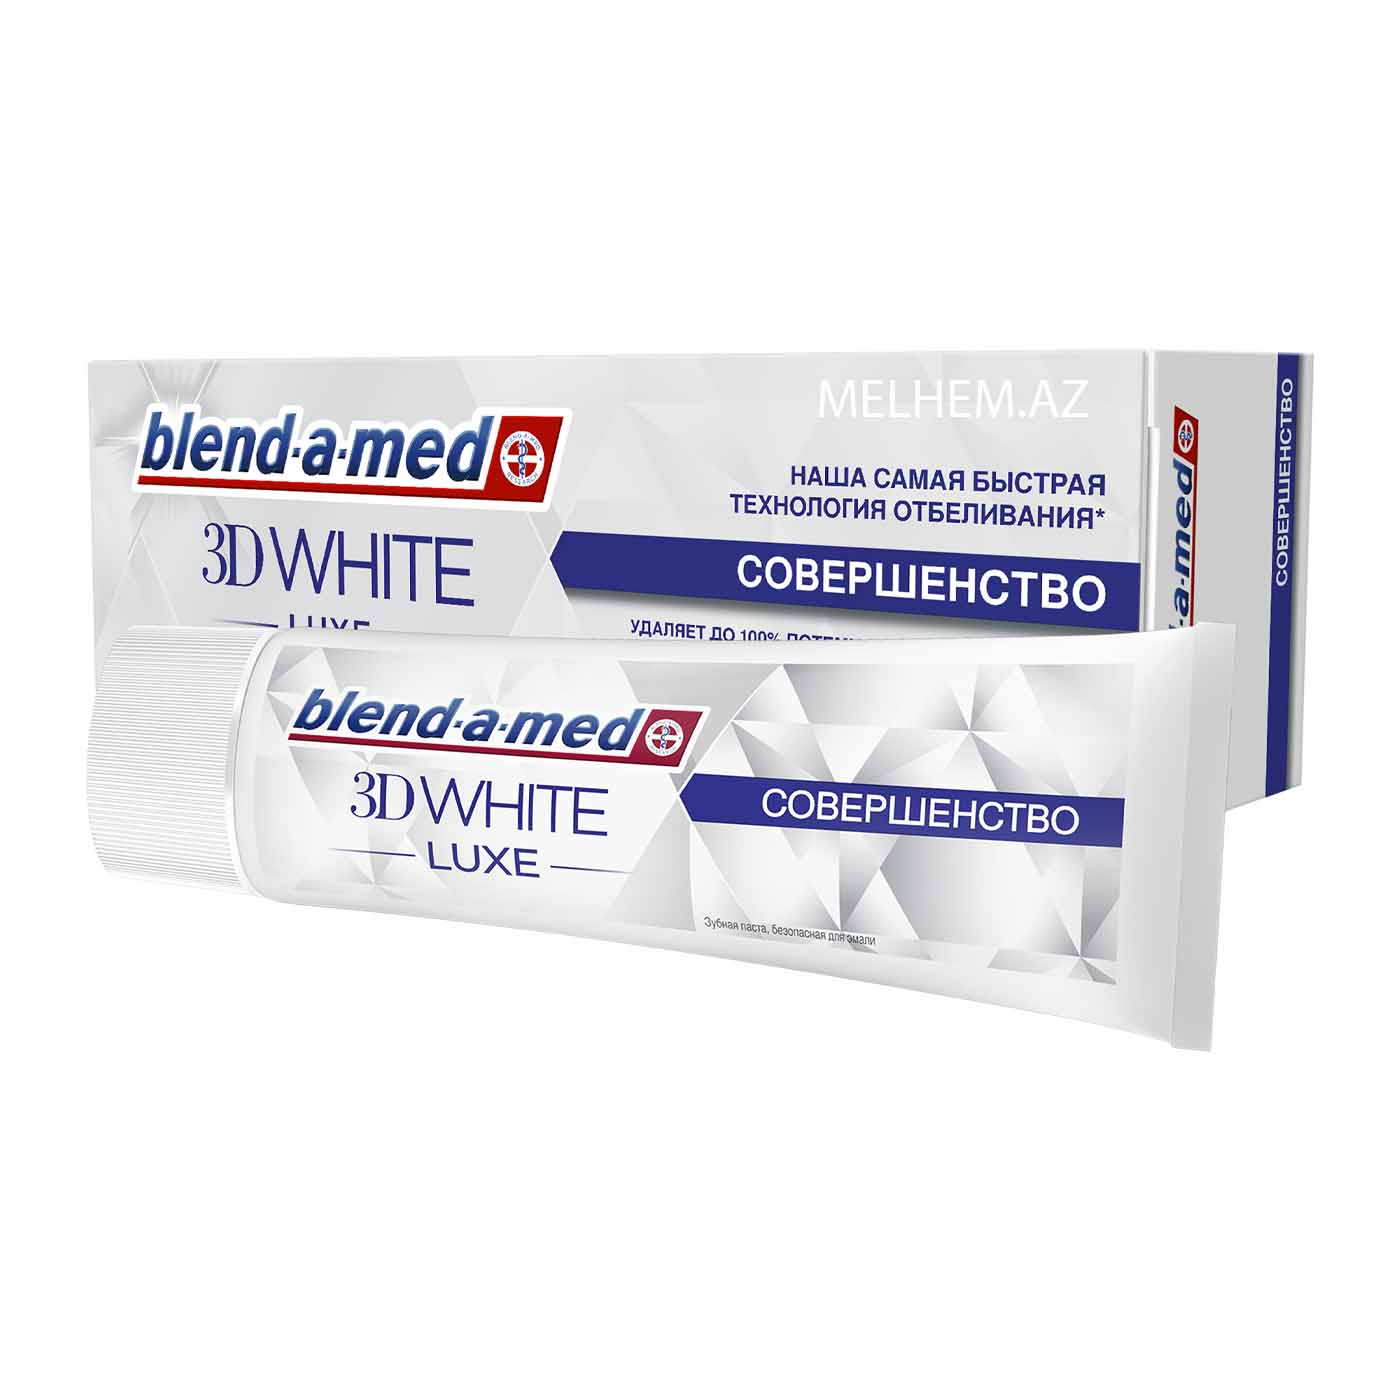 BLEND-A-MED 3D WHİTE LÜKS AĞARDICI 75 ML